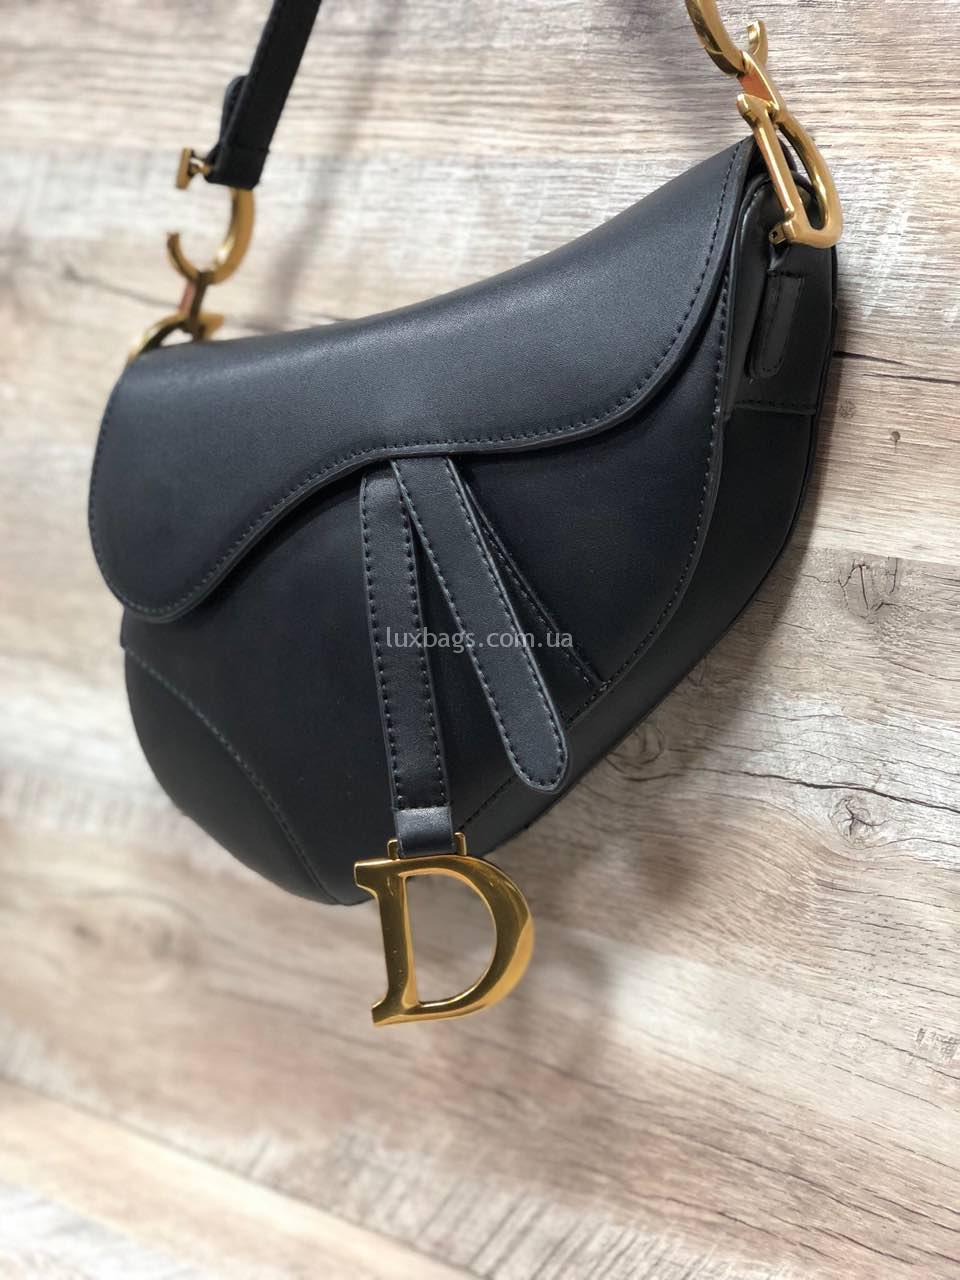 b2b0301c4404 Женская стильная сумка Dior Диор фото черная · сумочка диор saddle bag ·  сумочка седло черная от диор